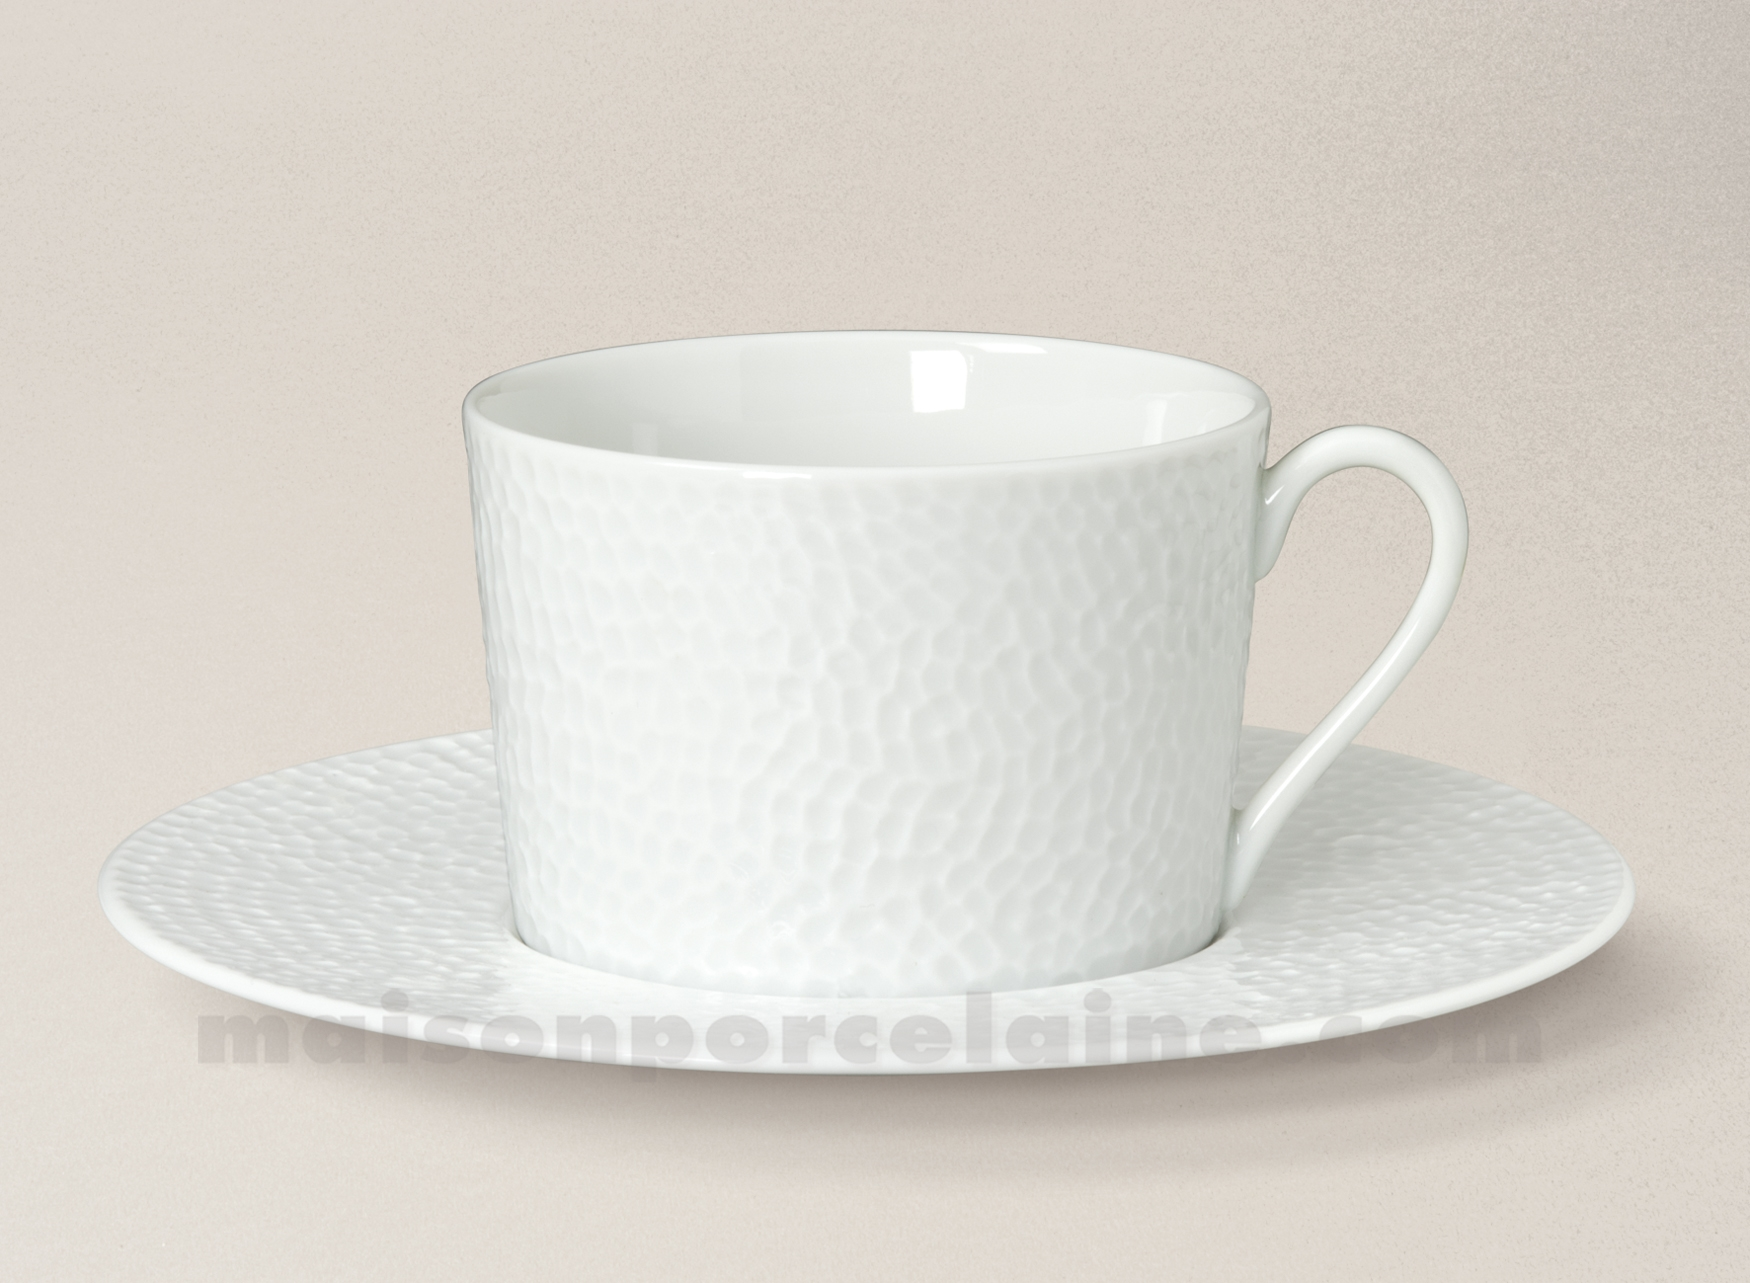 tasse the soucoupe porcelaine blanche emulsion 8 5x8 20cl. Black Bedroom Furniture Sets. Home Design Ideas